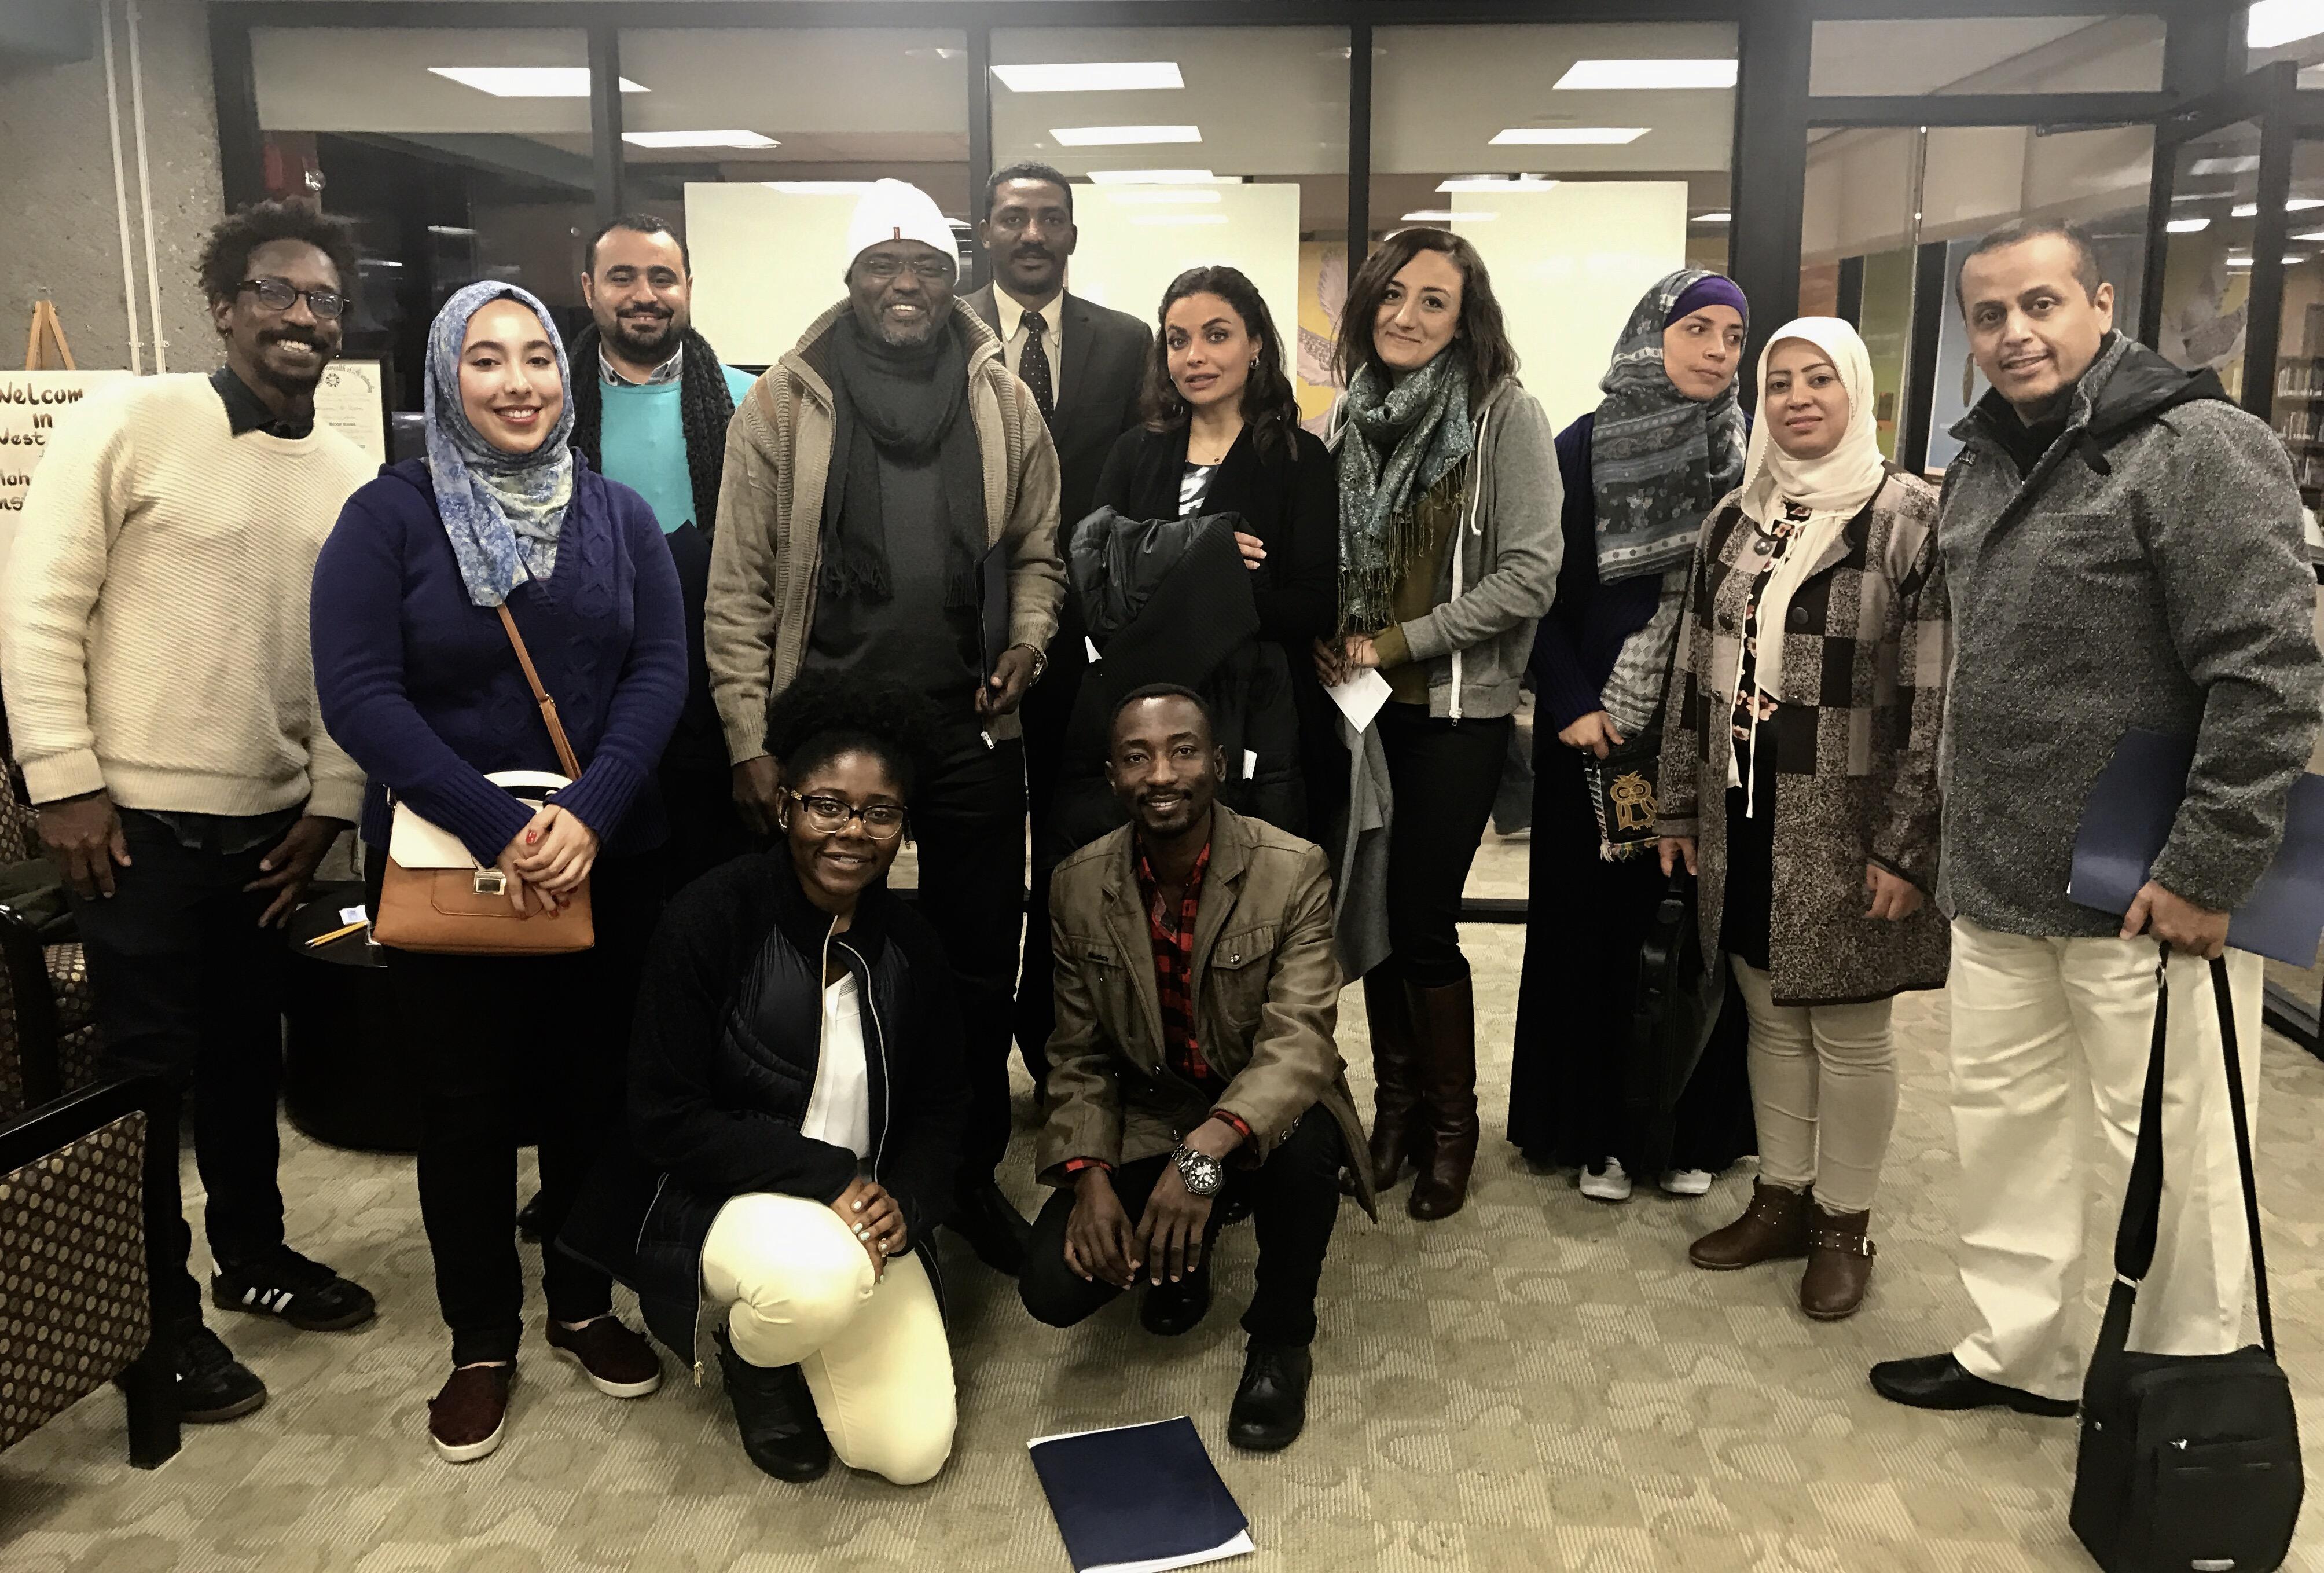 Human & Civil Rights Delegation Visit Muhammad Ali Institute